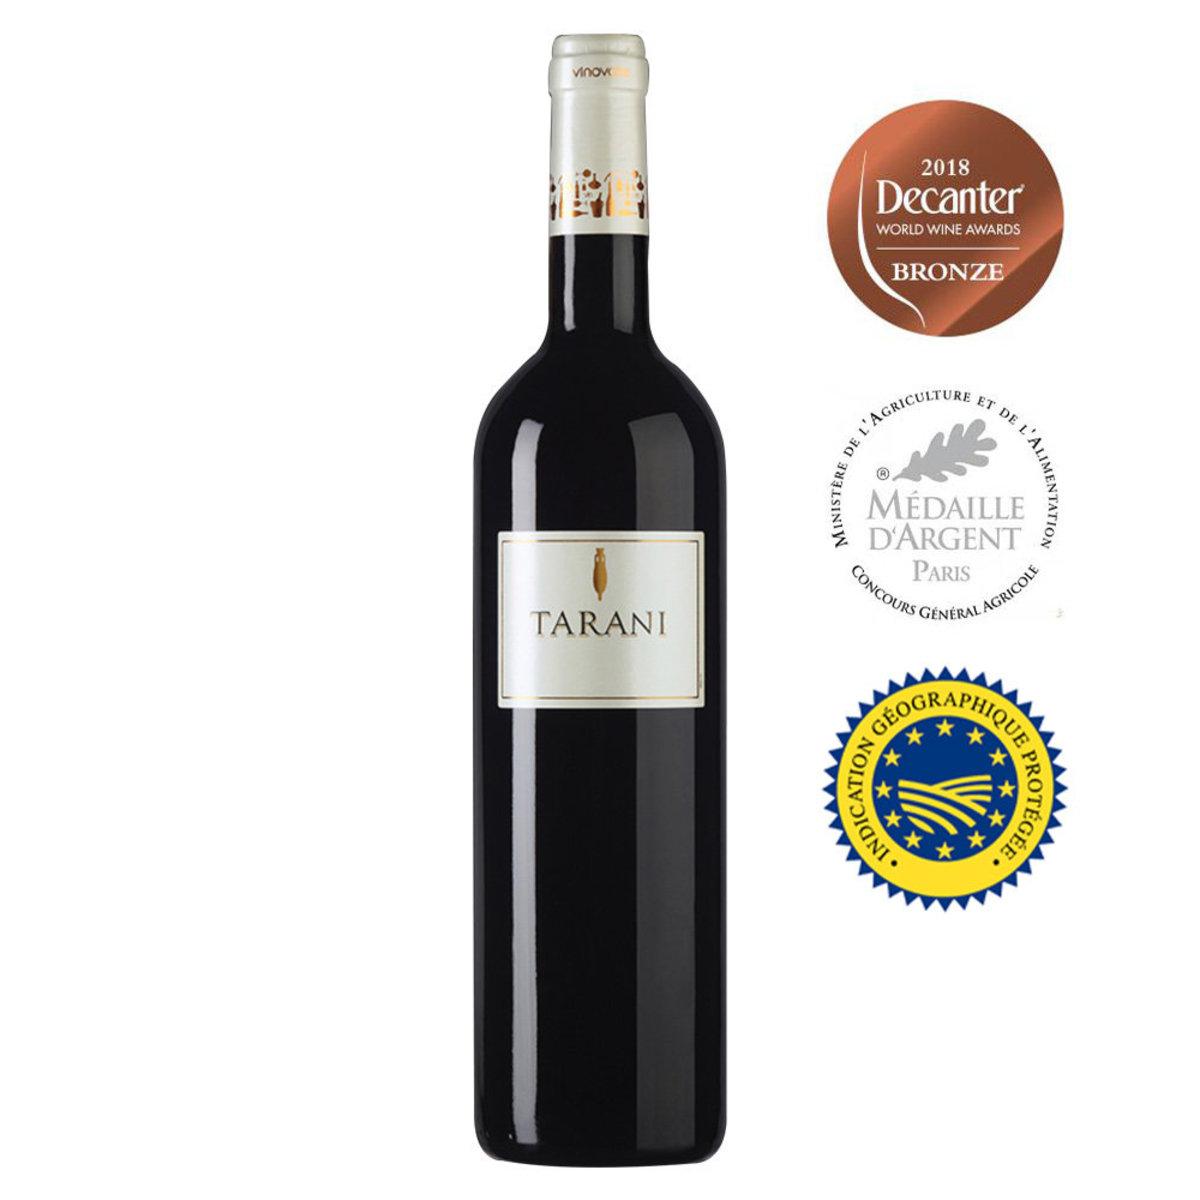 【法國紅酒】Tarani Cabernet Sauvignon 2016/17